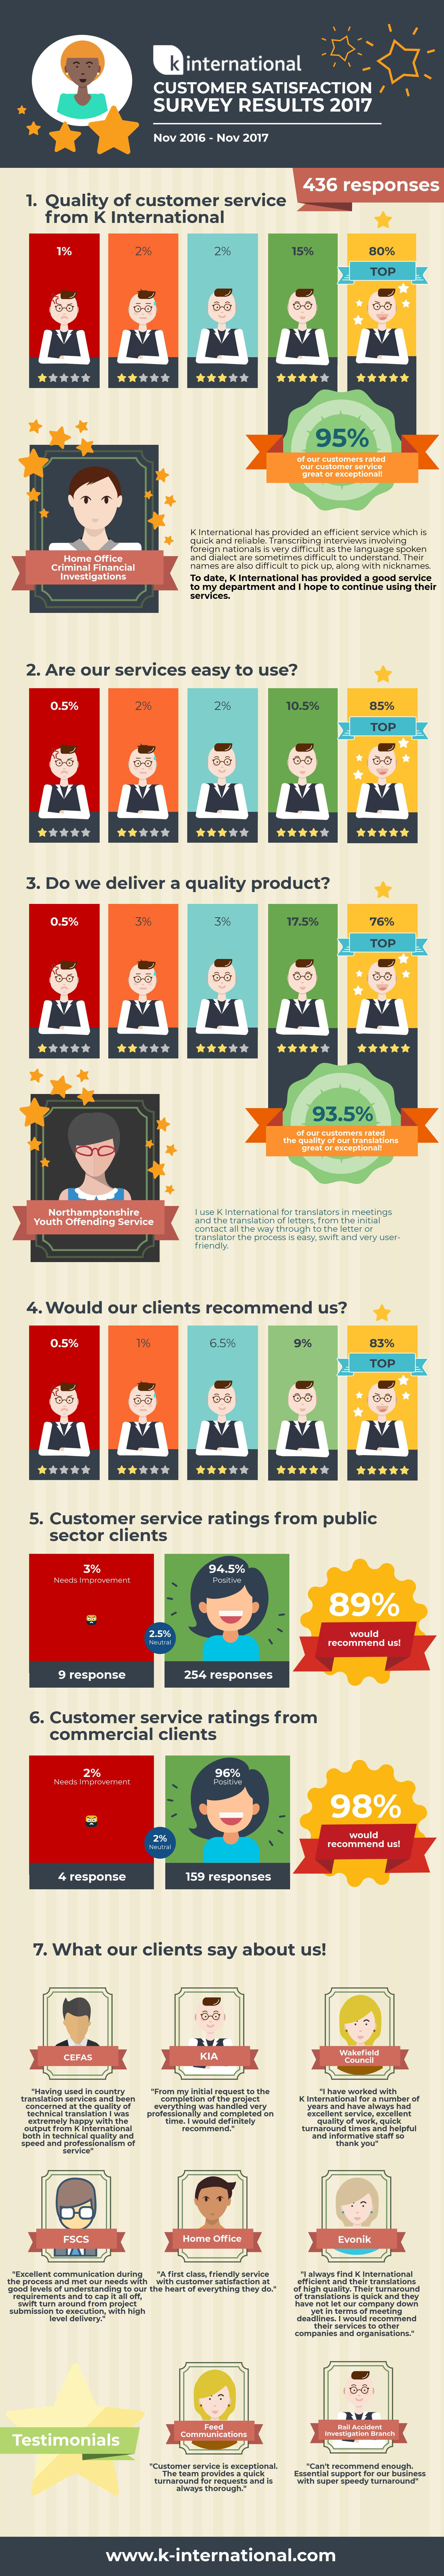 K International Customer Satisfaction Survey 2017